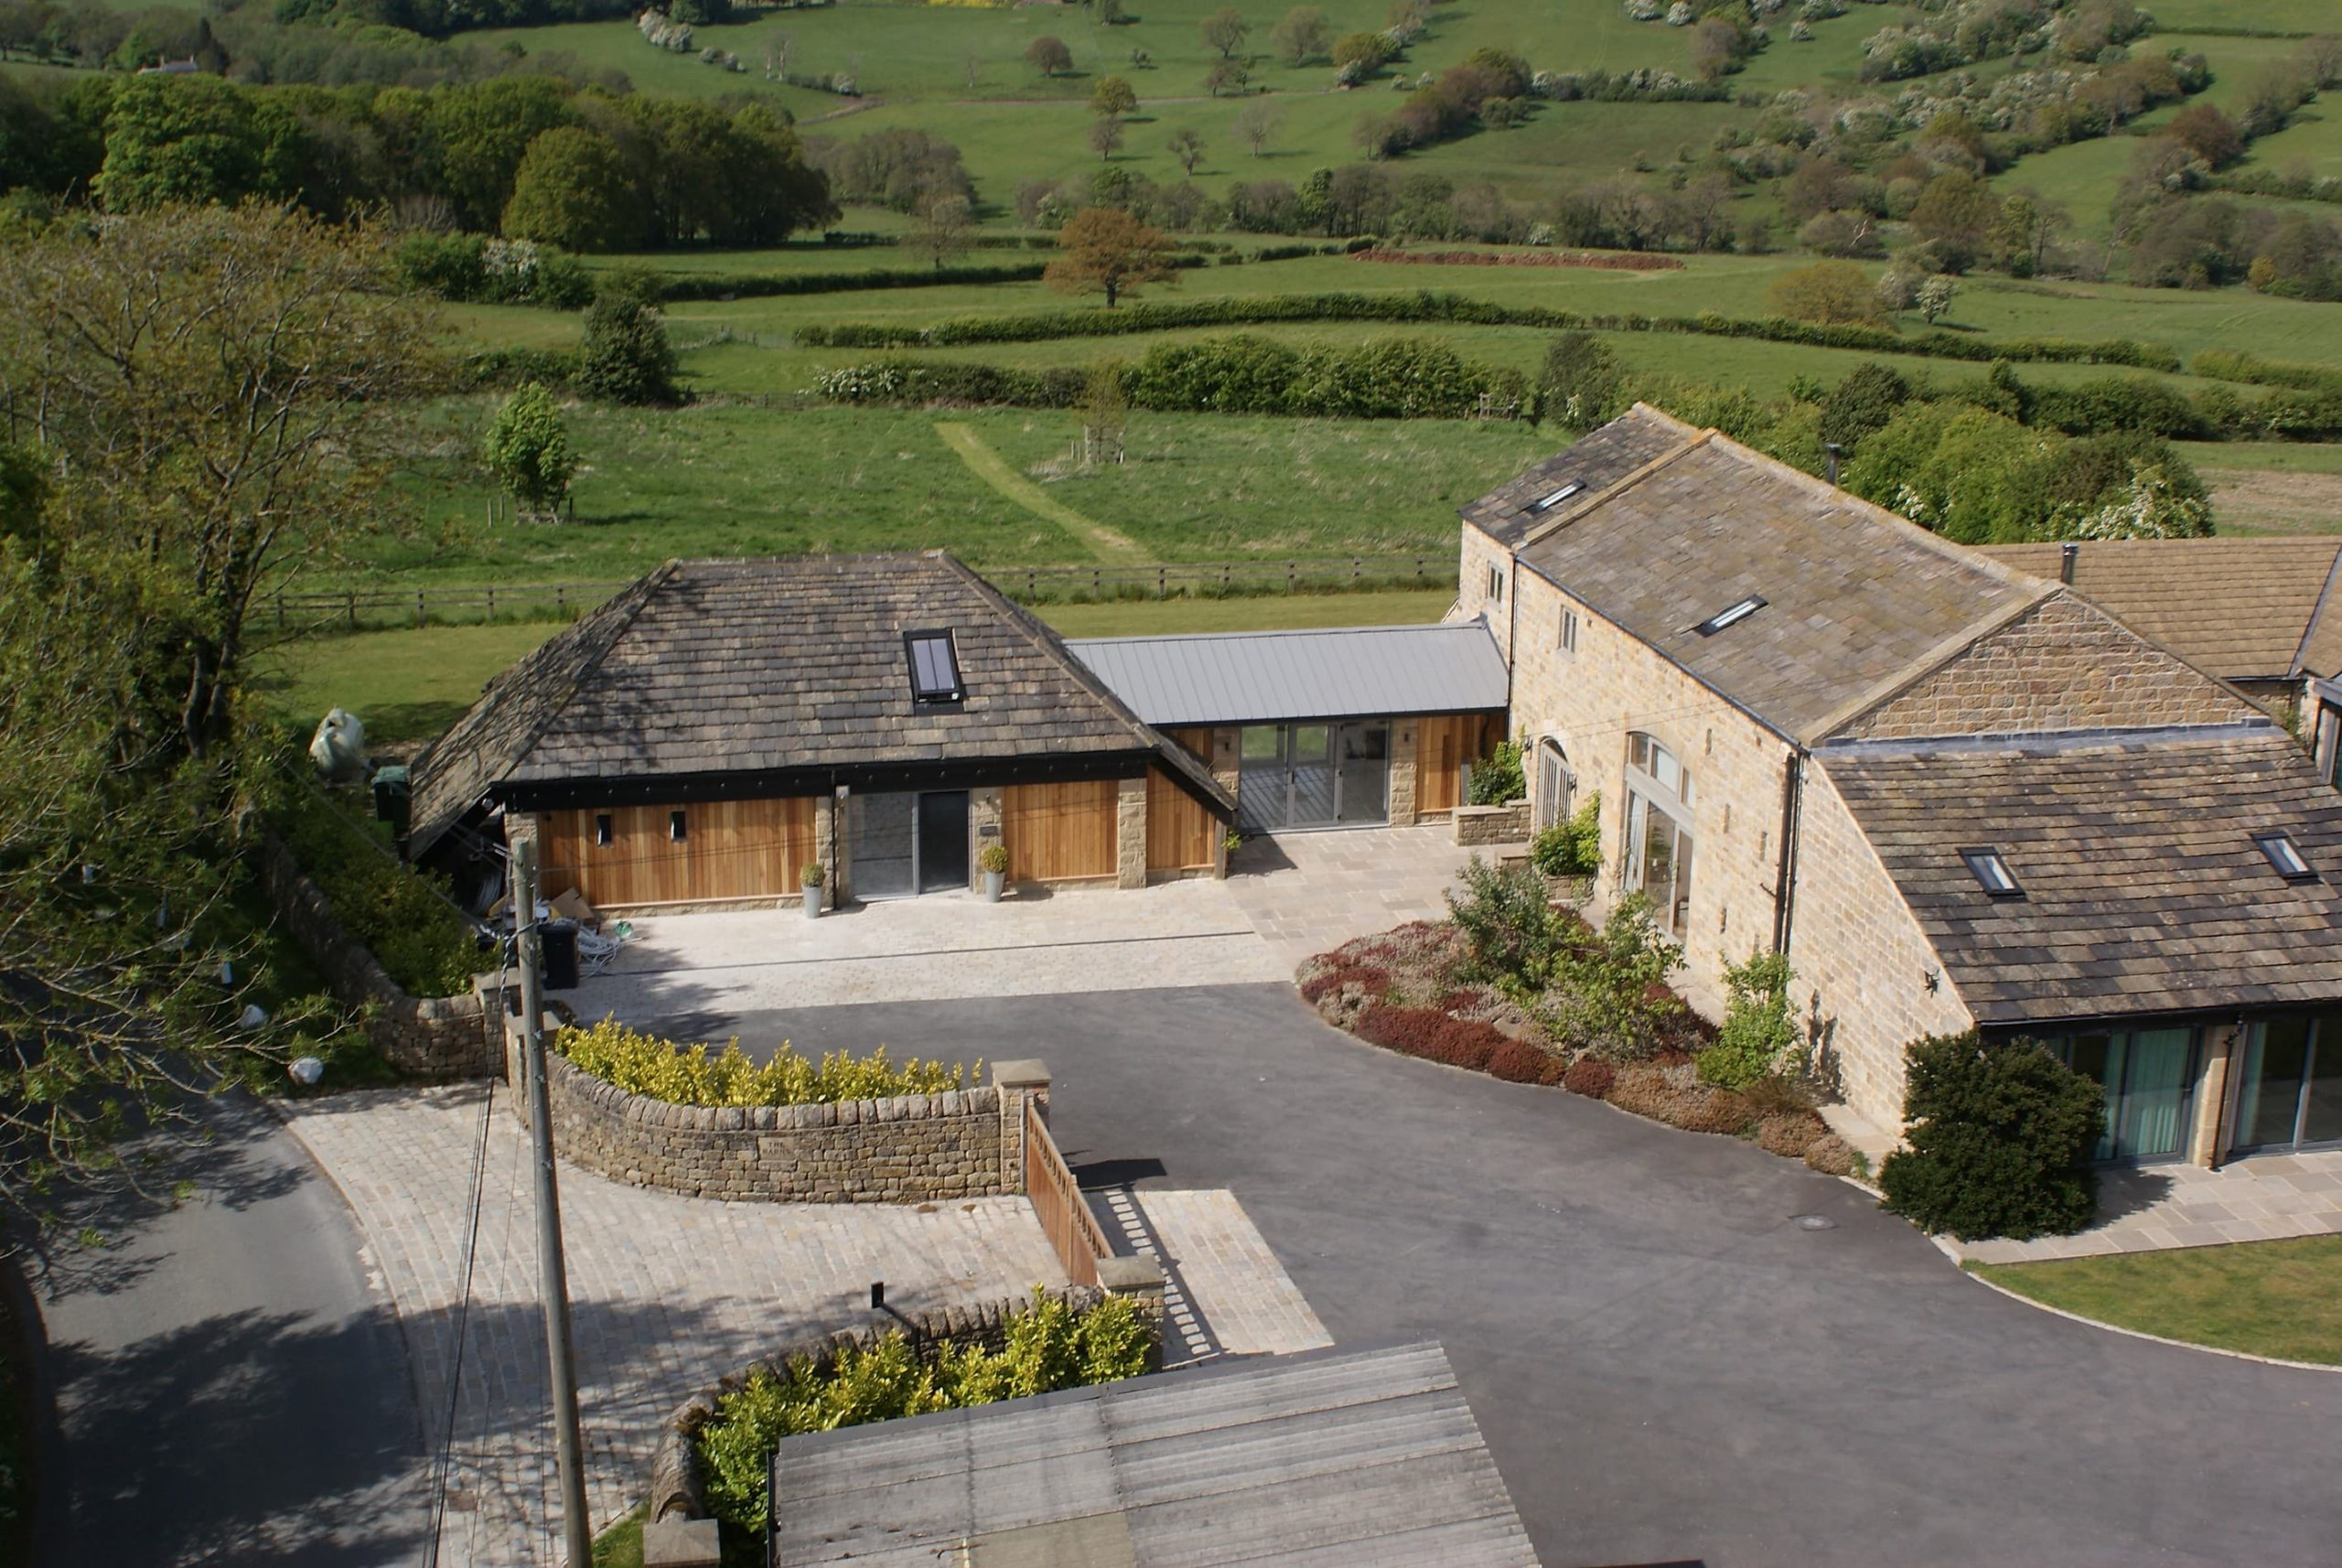 The Amazing Yorkshire Barn